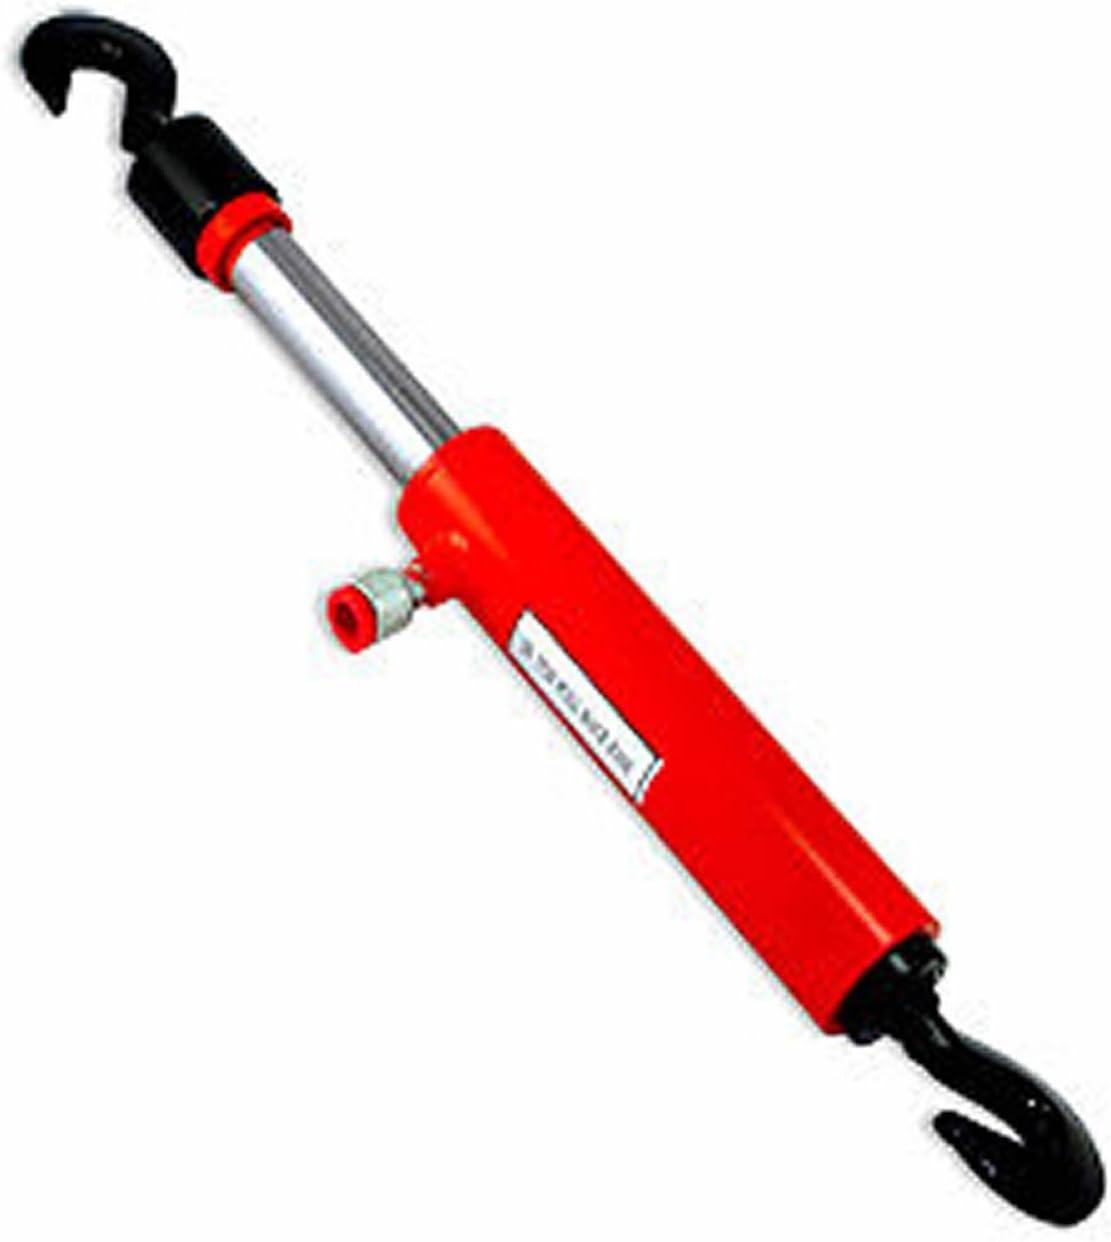 "XtremepowerUS VD-4972AT 26/"" Long 10 Ton Hydraulic Pull Back Ram for Porta Power"